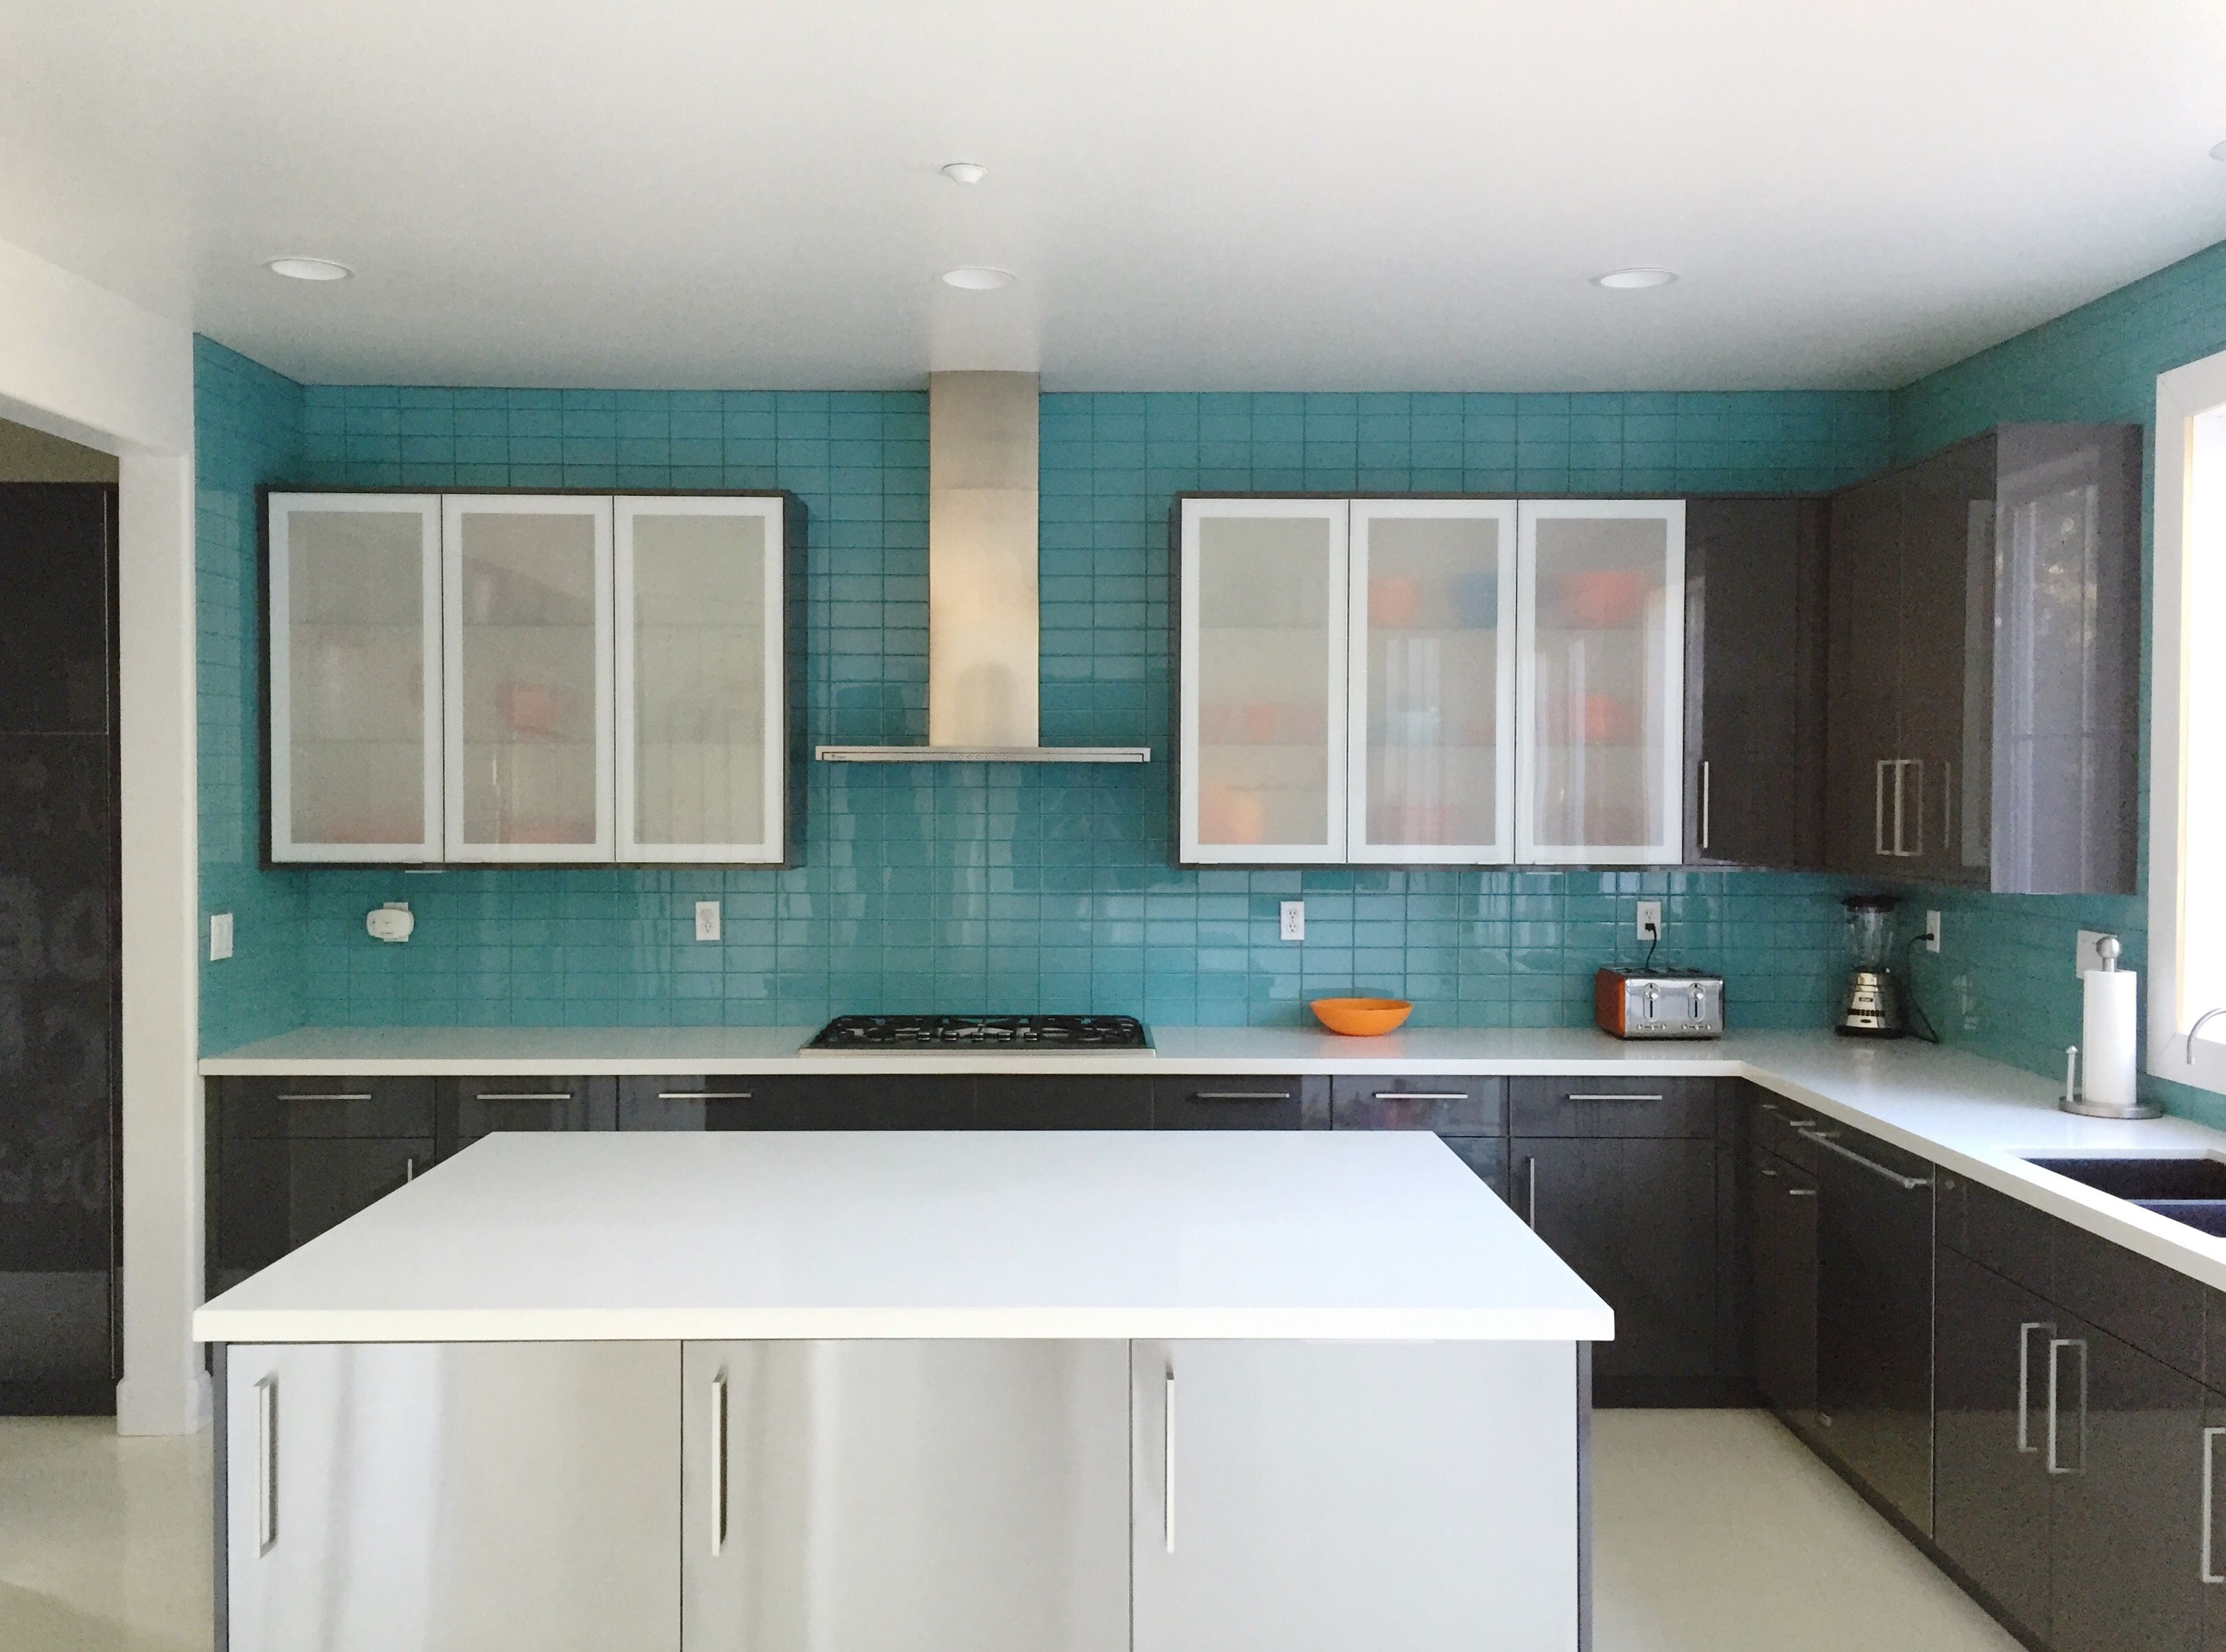 Aqua Glass Subway Tile Modern Kitchen Backsplash Contemporary